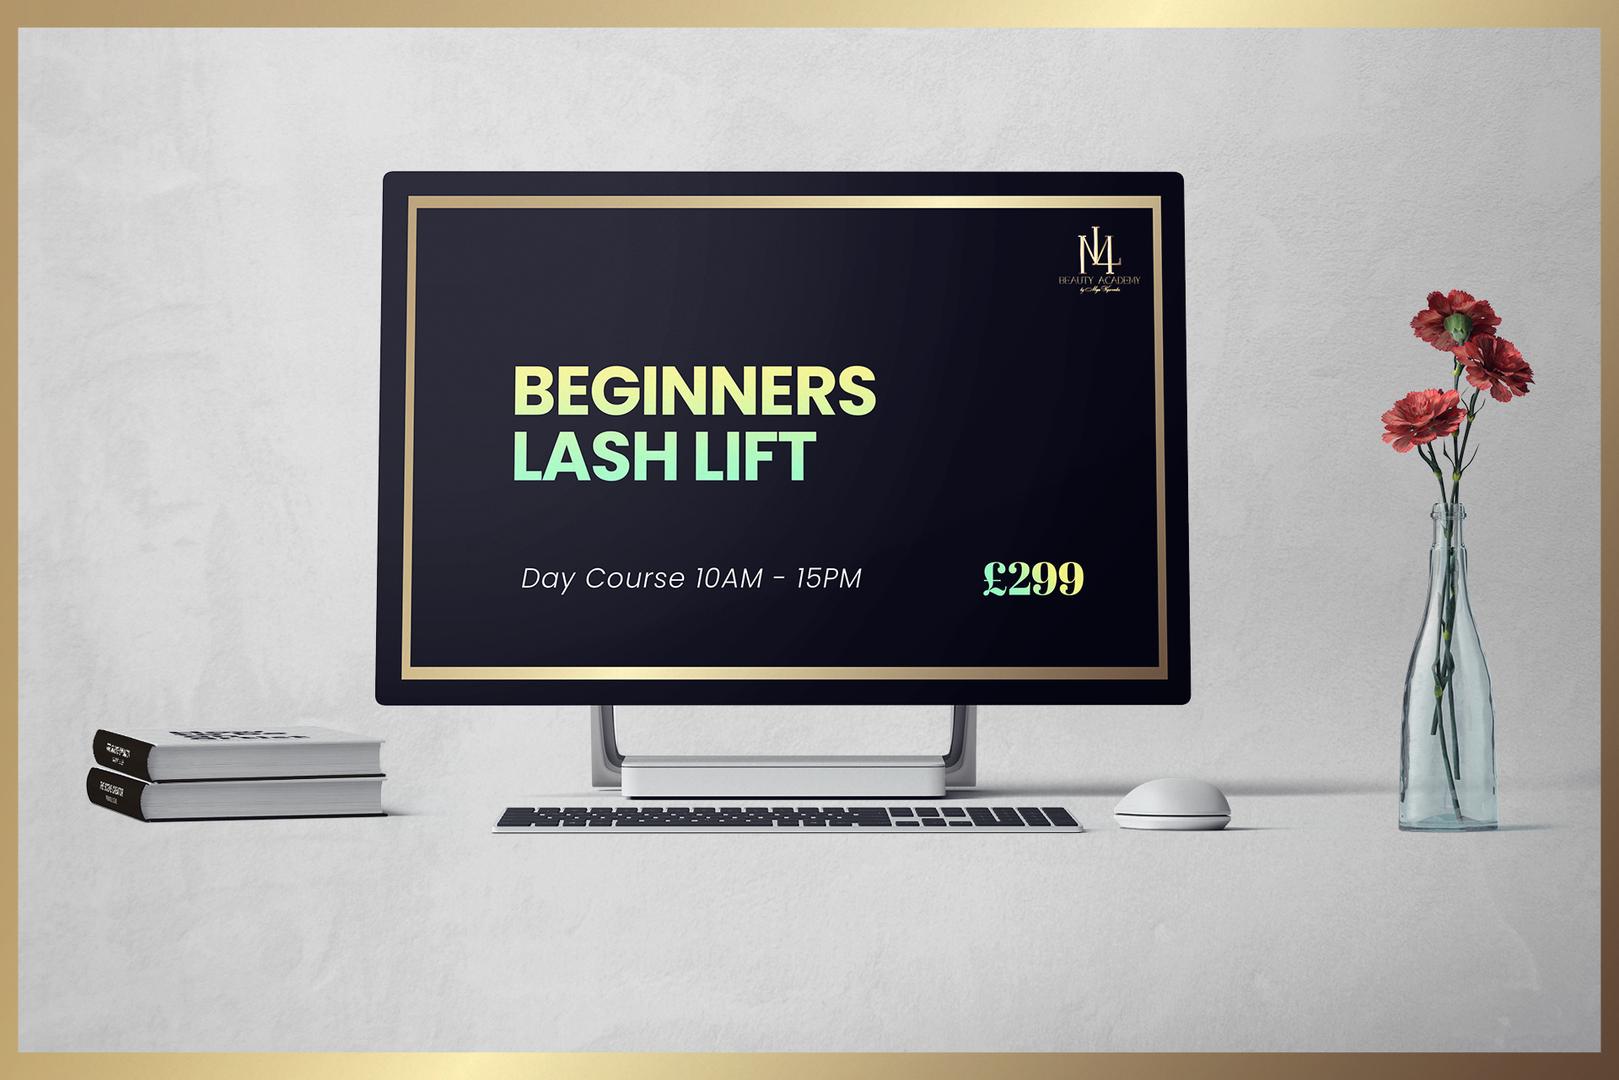 ml-beginners-lash-lift.png